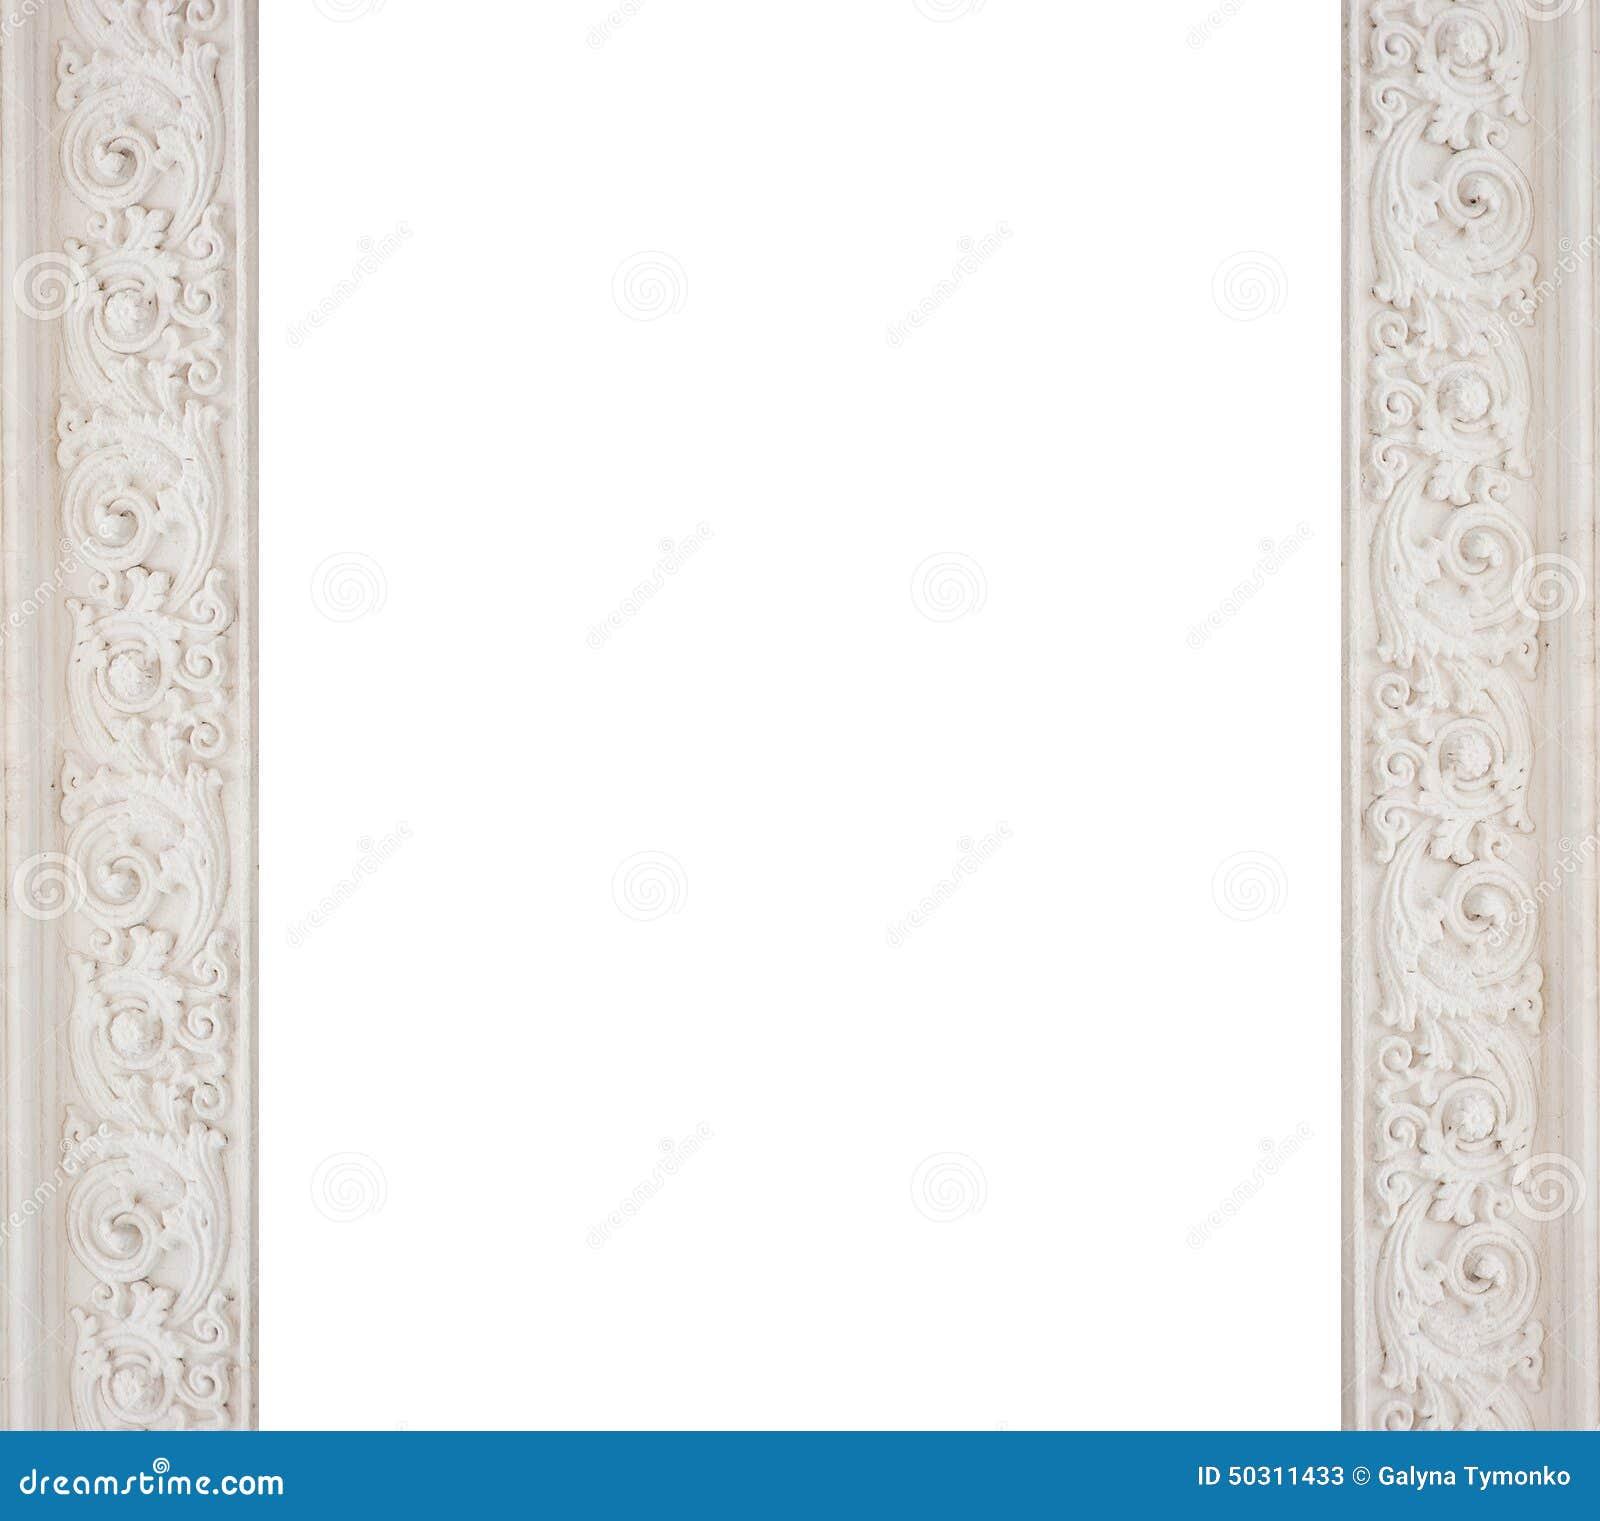 Art Architectural White Frame Molding Stock Image - Image of full ...